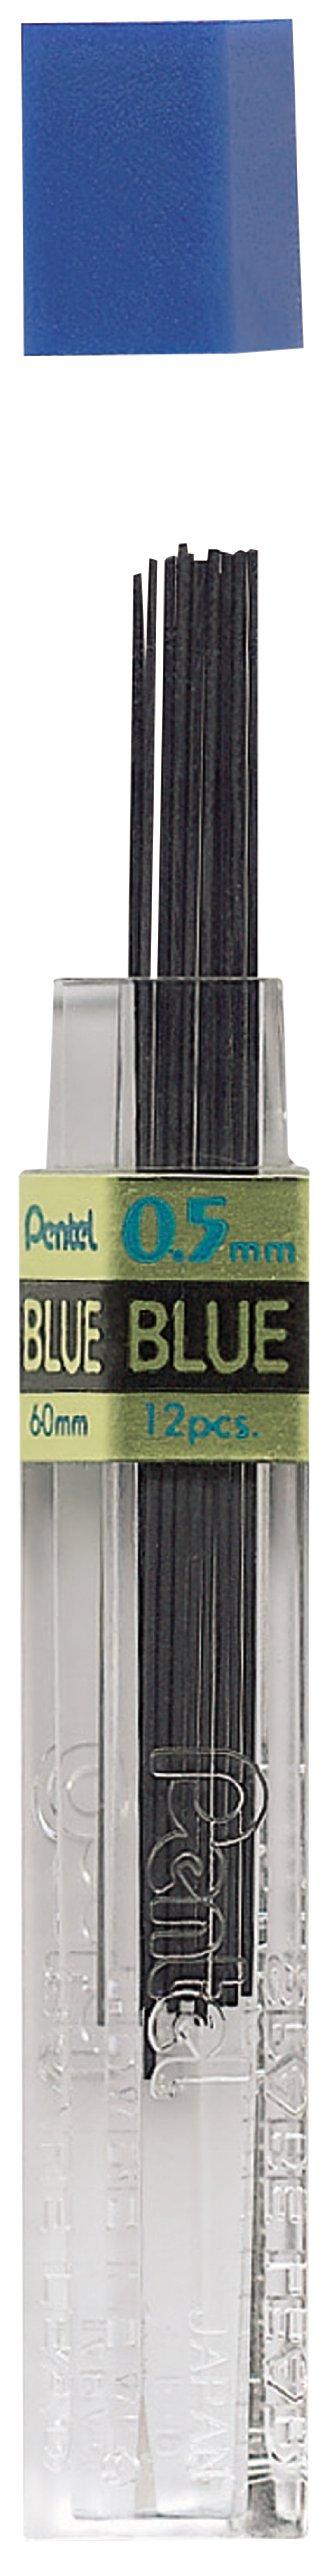 Pentel 12 Minas (1 Tubo) 0.5mm Azul